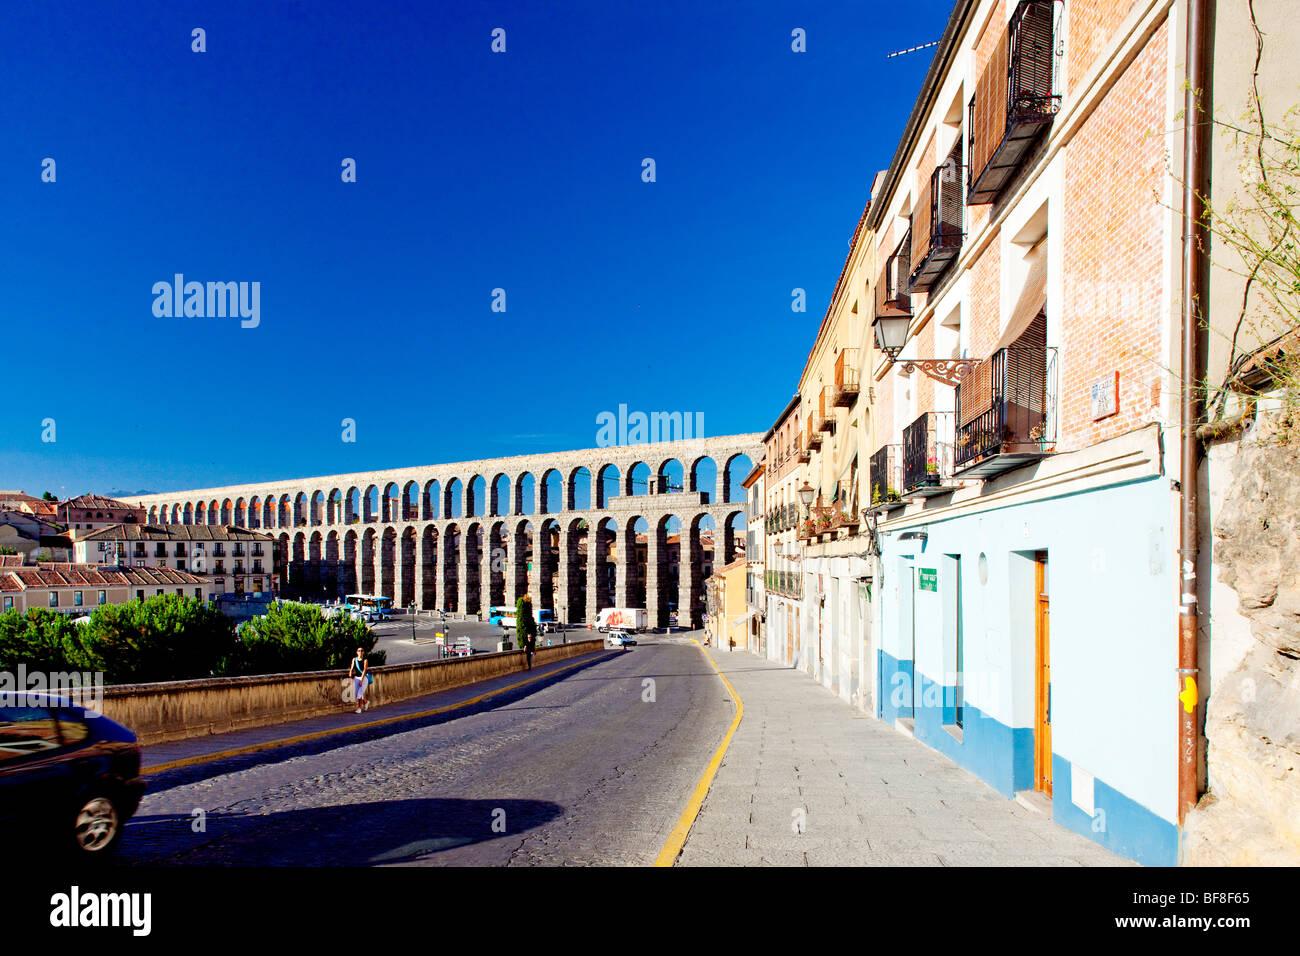 Segovia, Castile and Leon, Spain - Stock Image